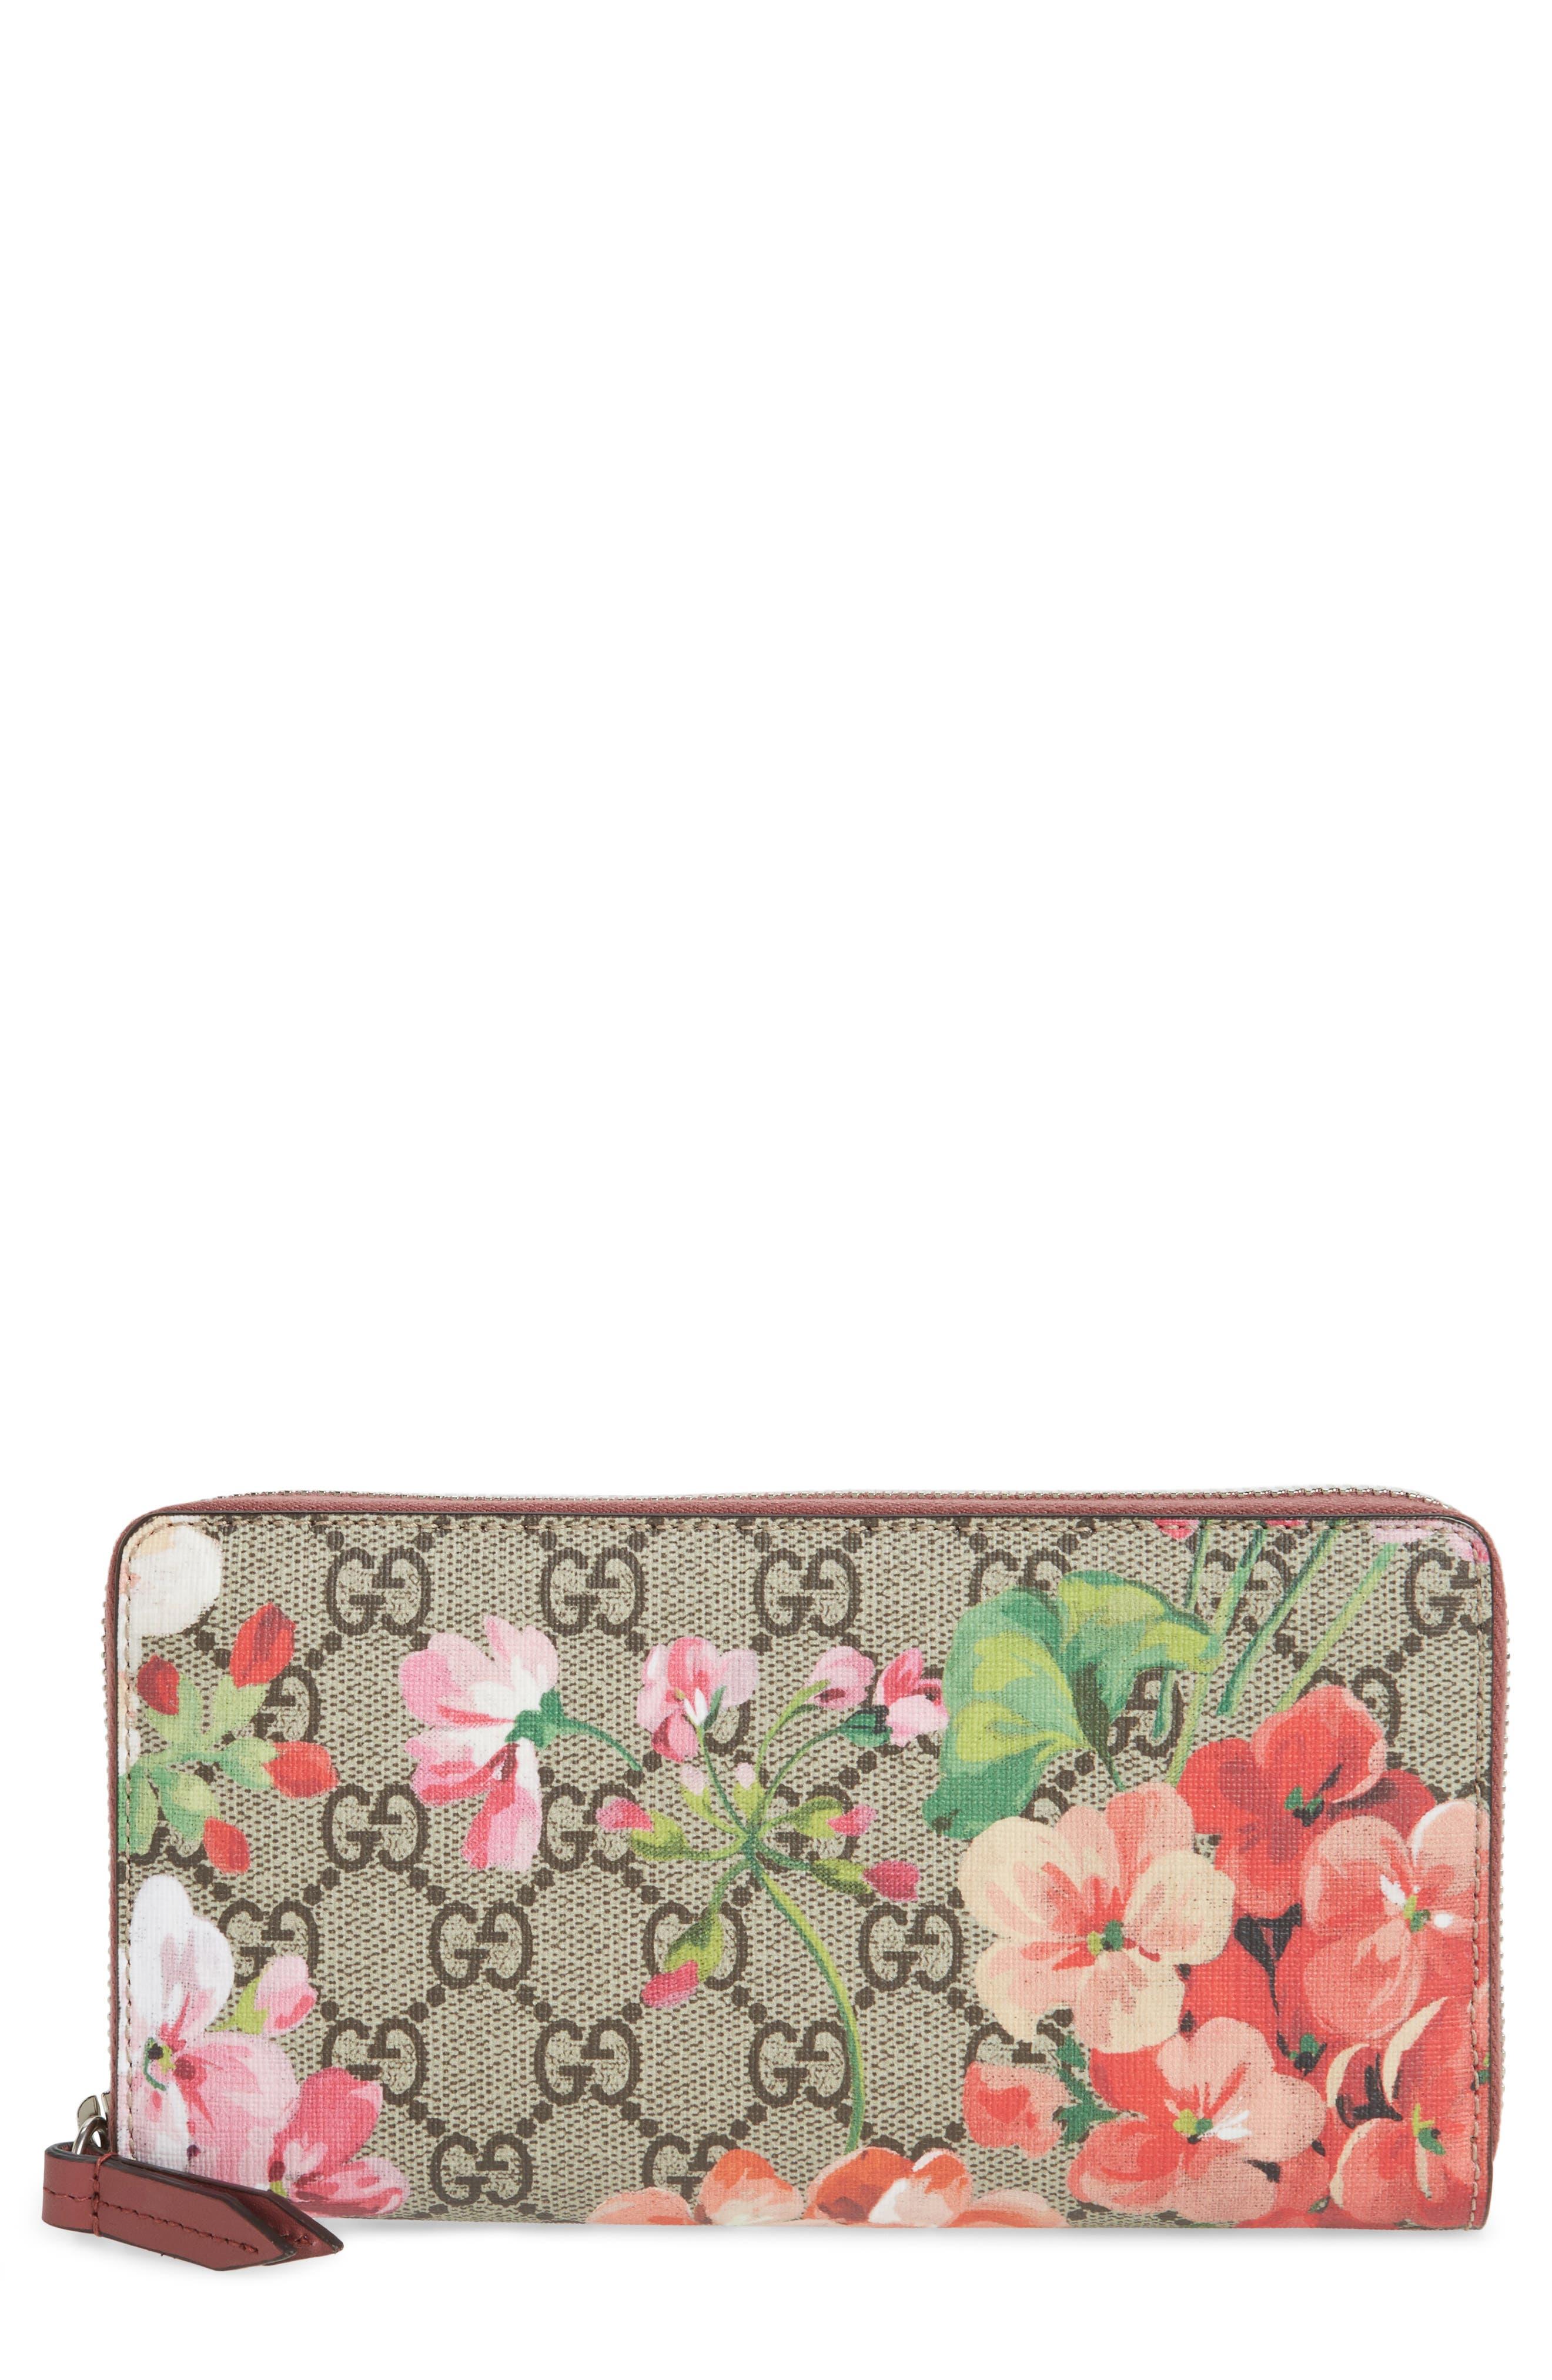 GG Blooms Zip Around Wallet,                             Main thumbnail 1, color,                             Beige Ebony Multi/ Dry Rose